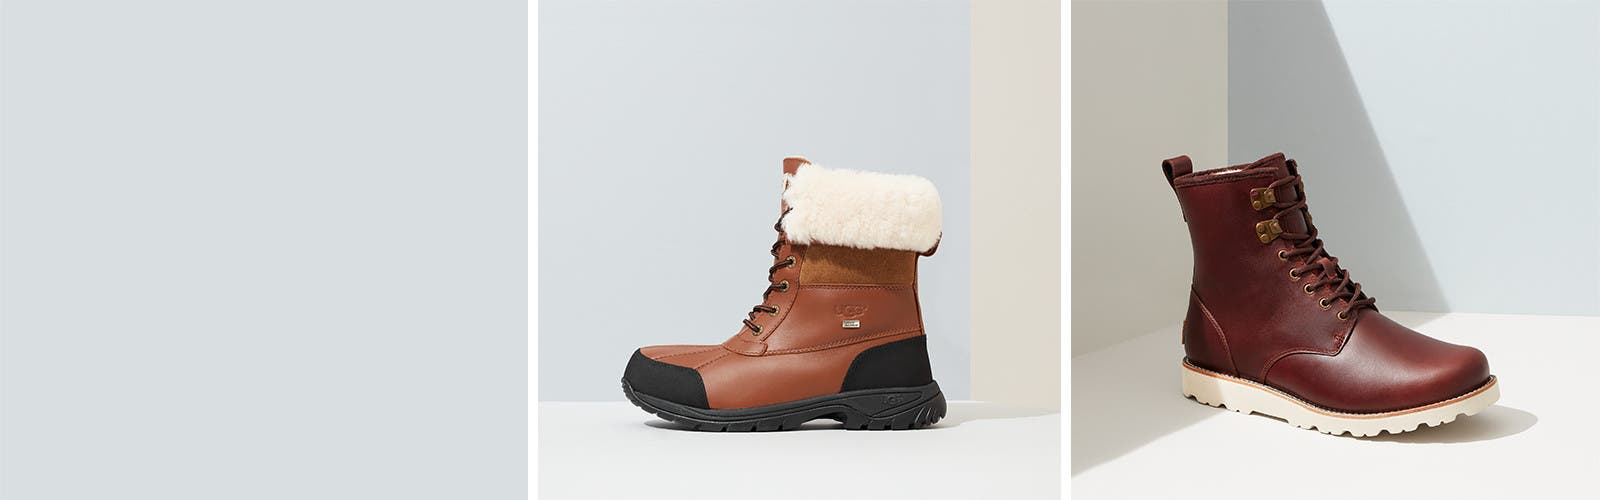 For all your winter wonderlands.